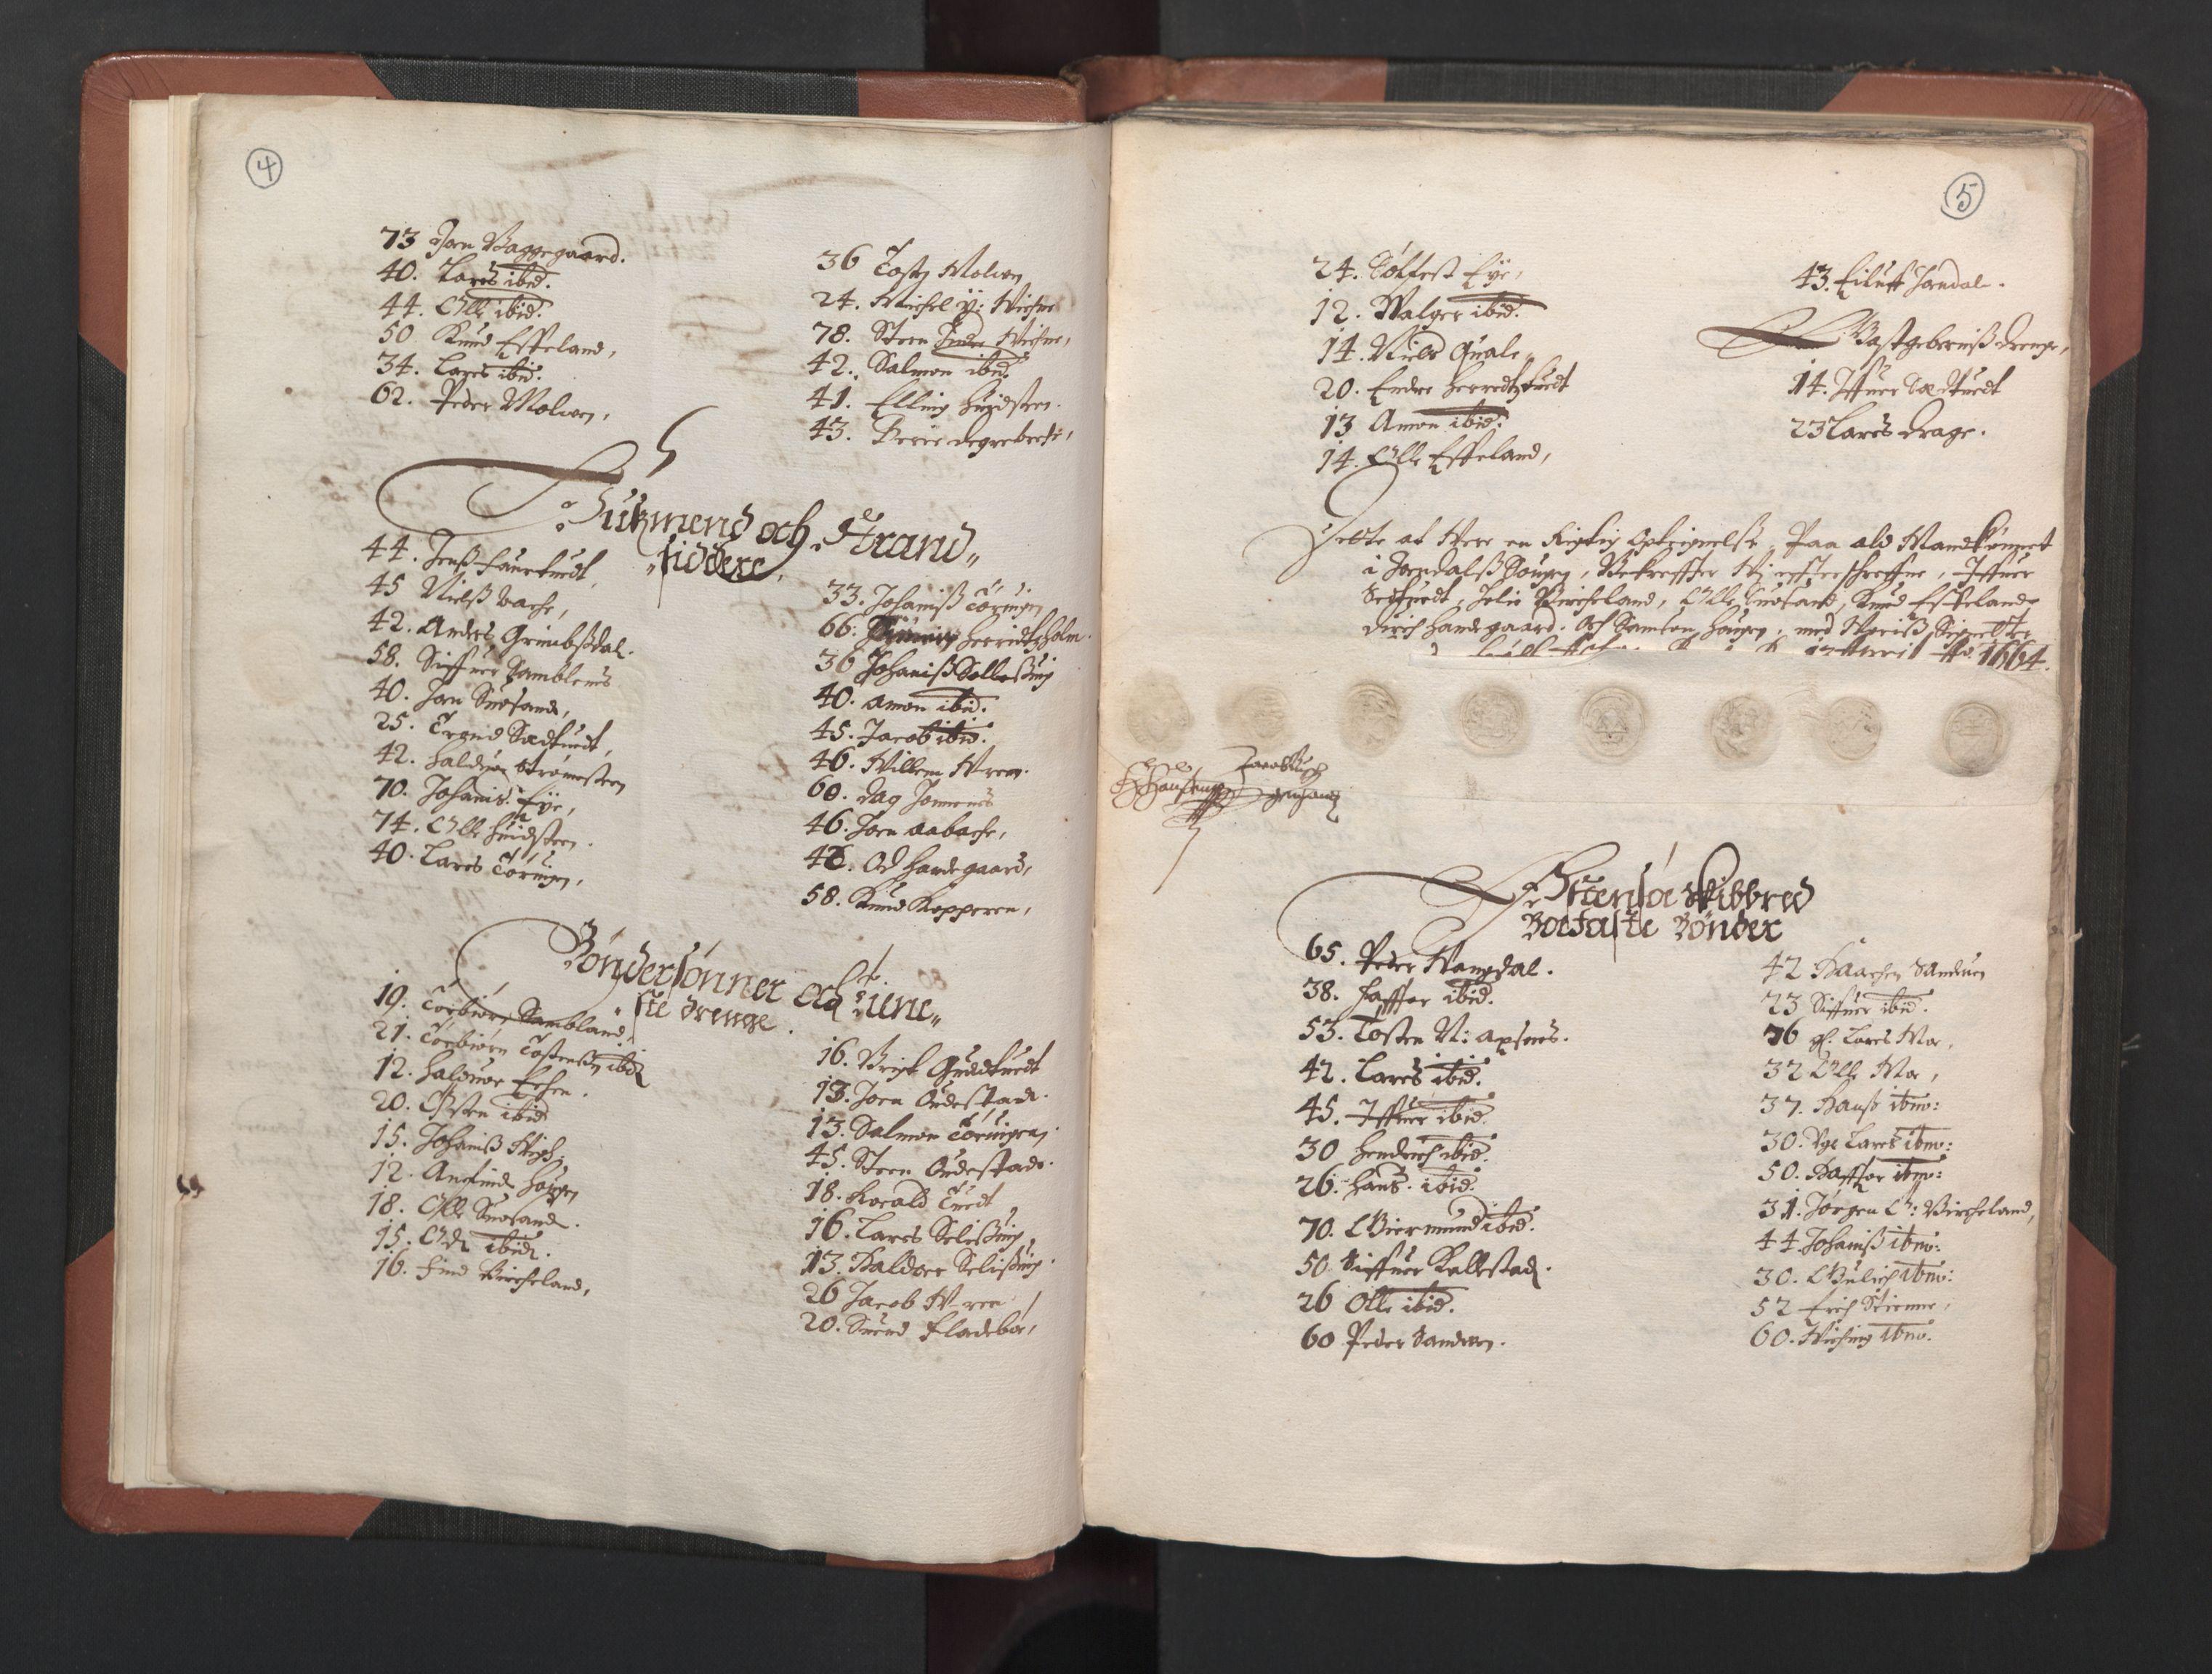 RA, Fogdenes og sorenskrivernes manntall 1664-1666, nr. 14: Hardanger len, Ytre Sogn fogderi og Indre Sogn fogderi, 1664-1665, s. 4-5